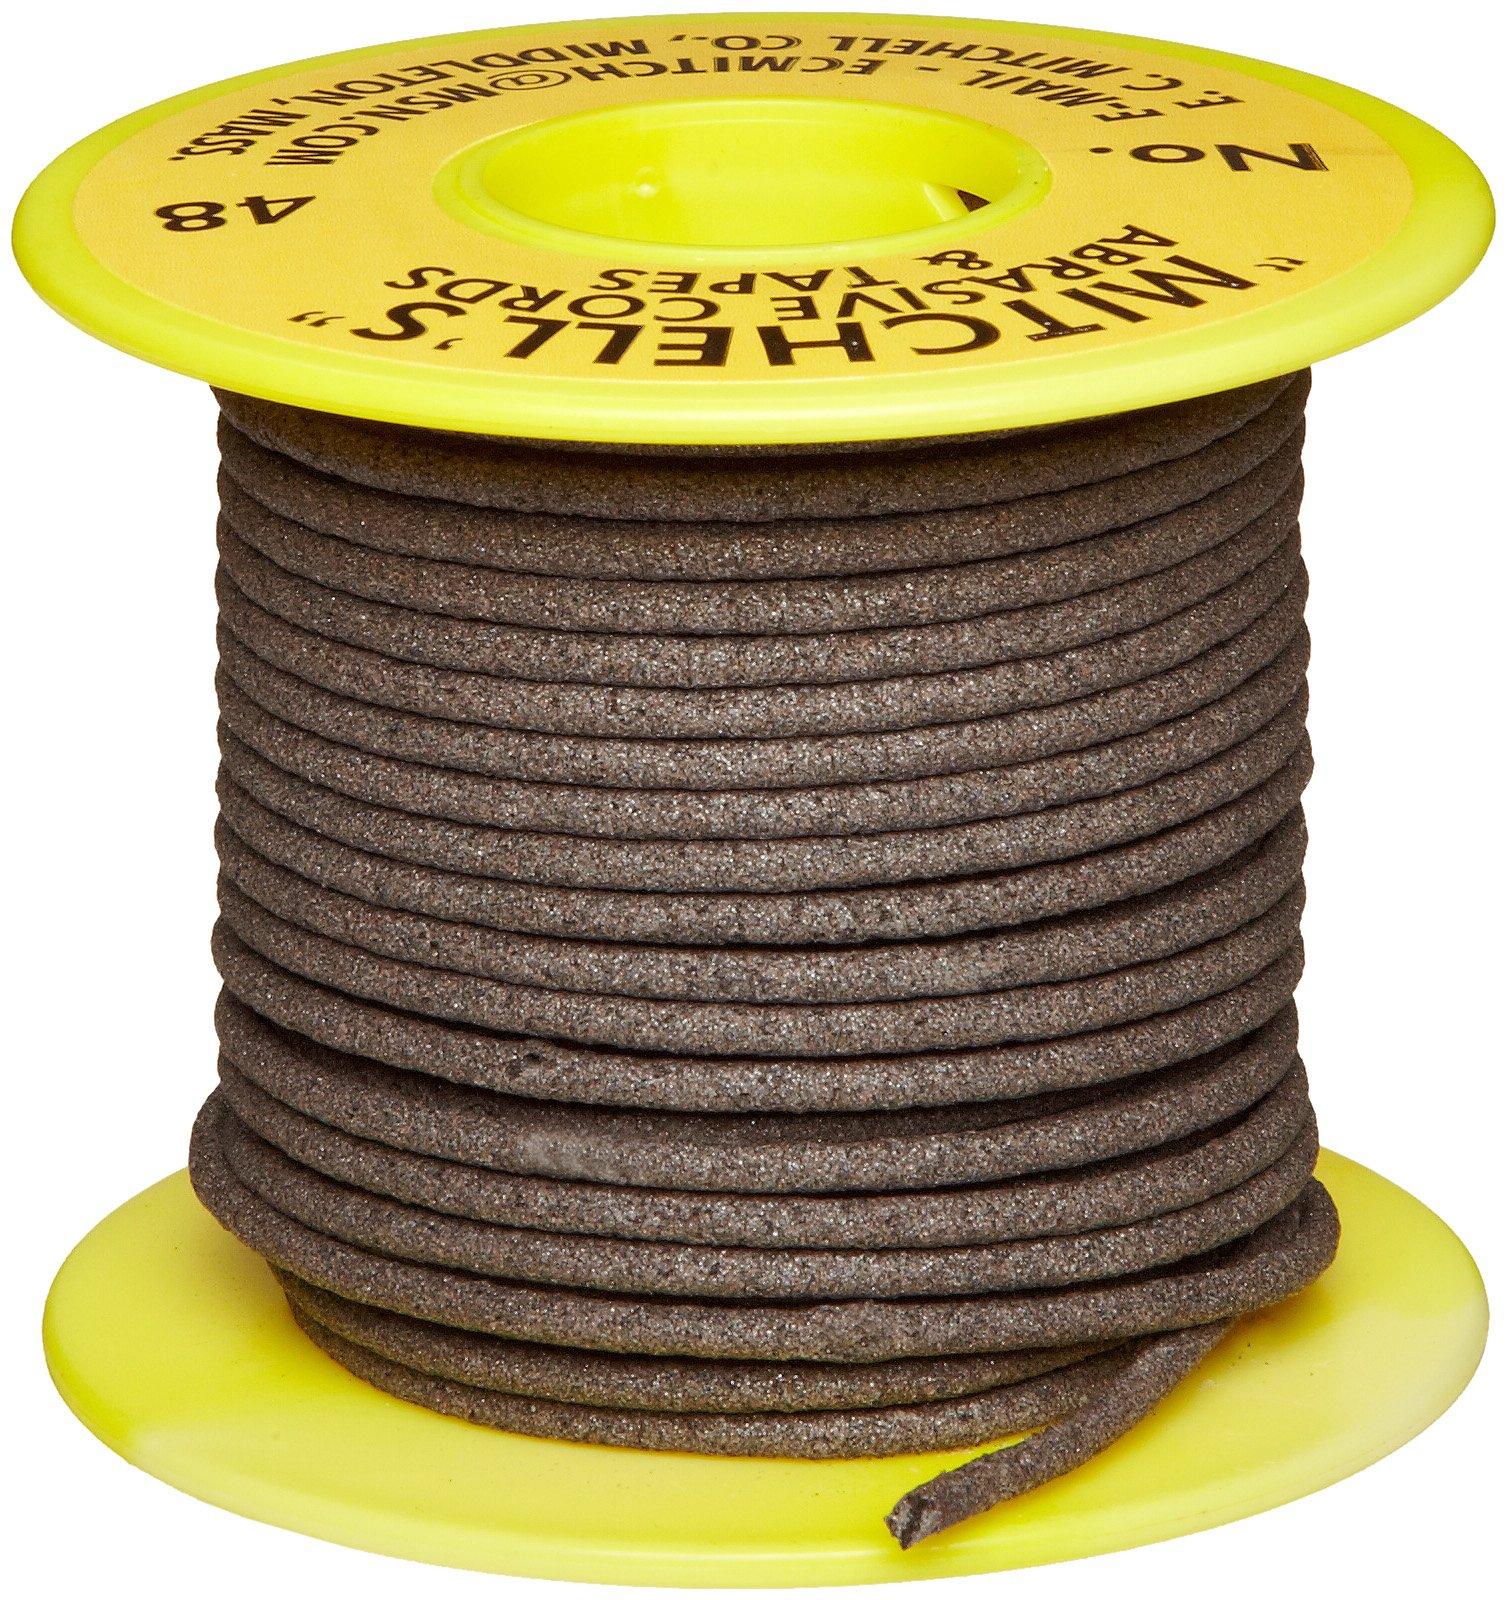 Mitchell Abrasives 48 Round Abrasive Cord, Aluminum Oxide 150 Grit .093'' Diameter x 50 Feet by Mitchell Abrasives